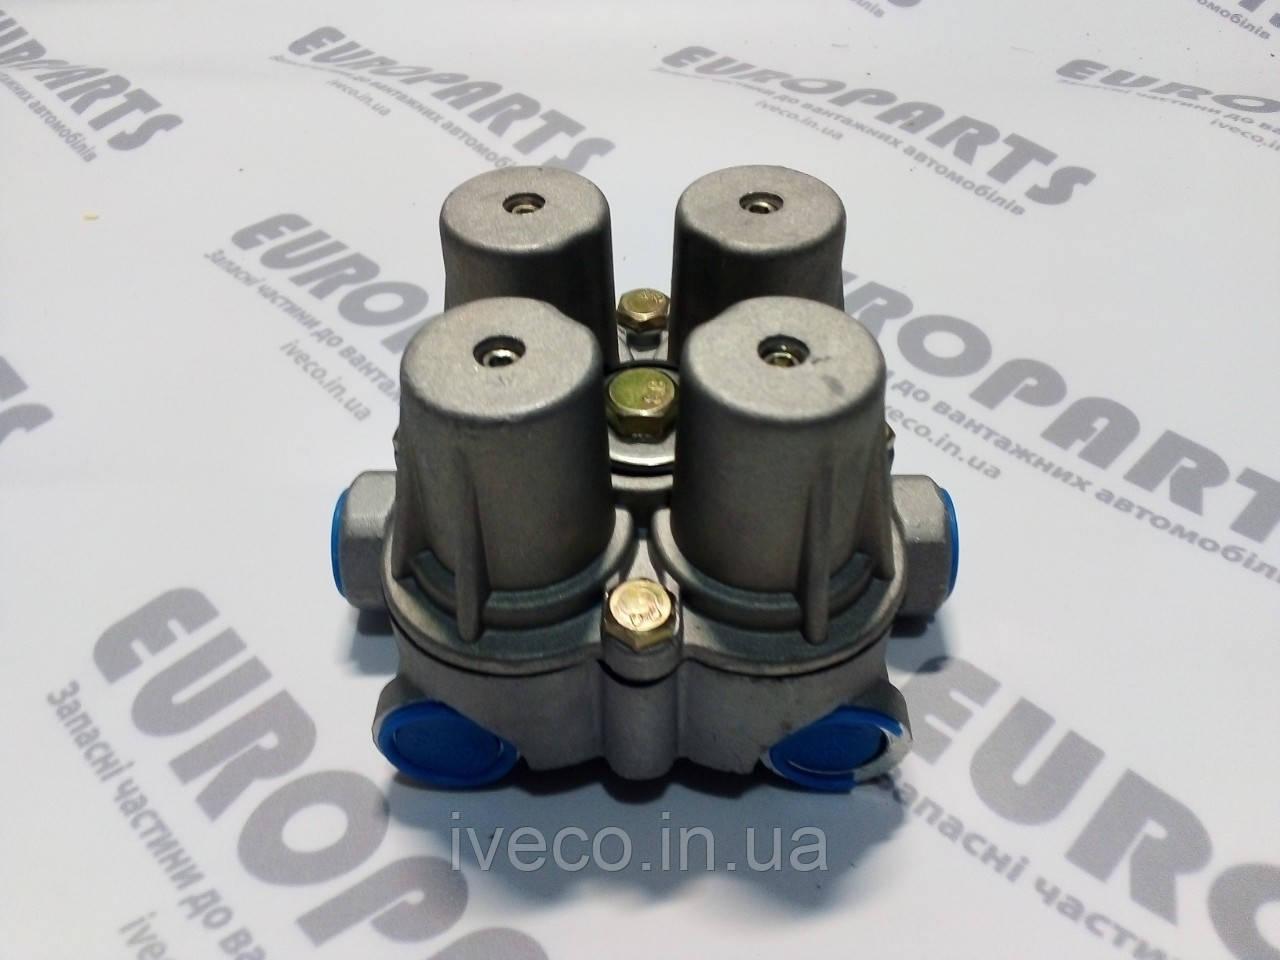 AE4168 Кран клапан защитный четырехконтурный 9347020400 1505397 IVECO  AE4409 AE4428 9347020530